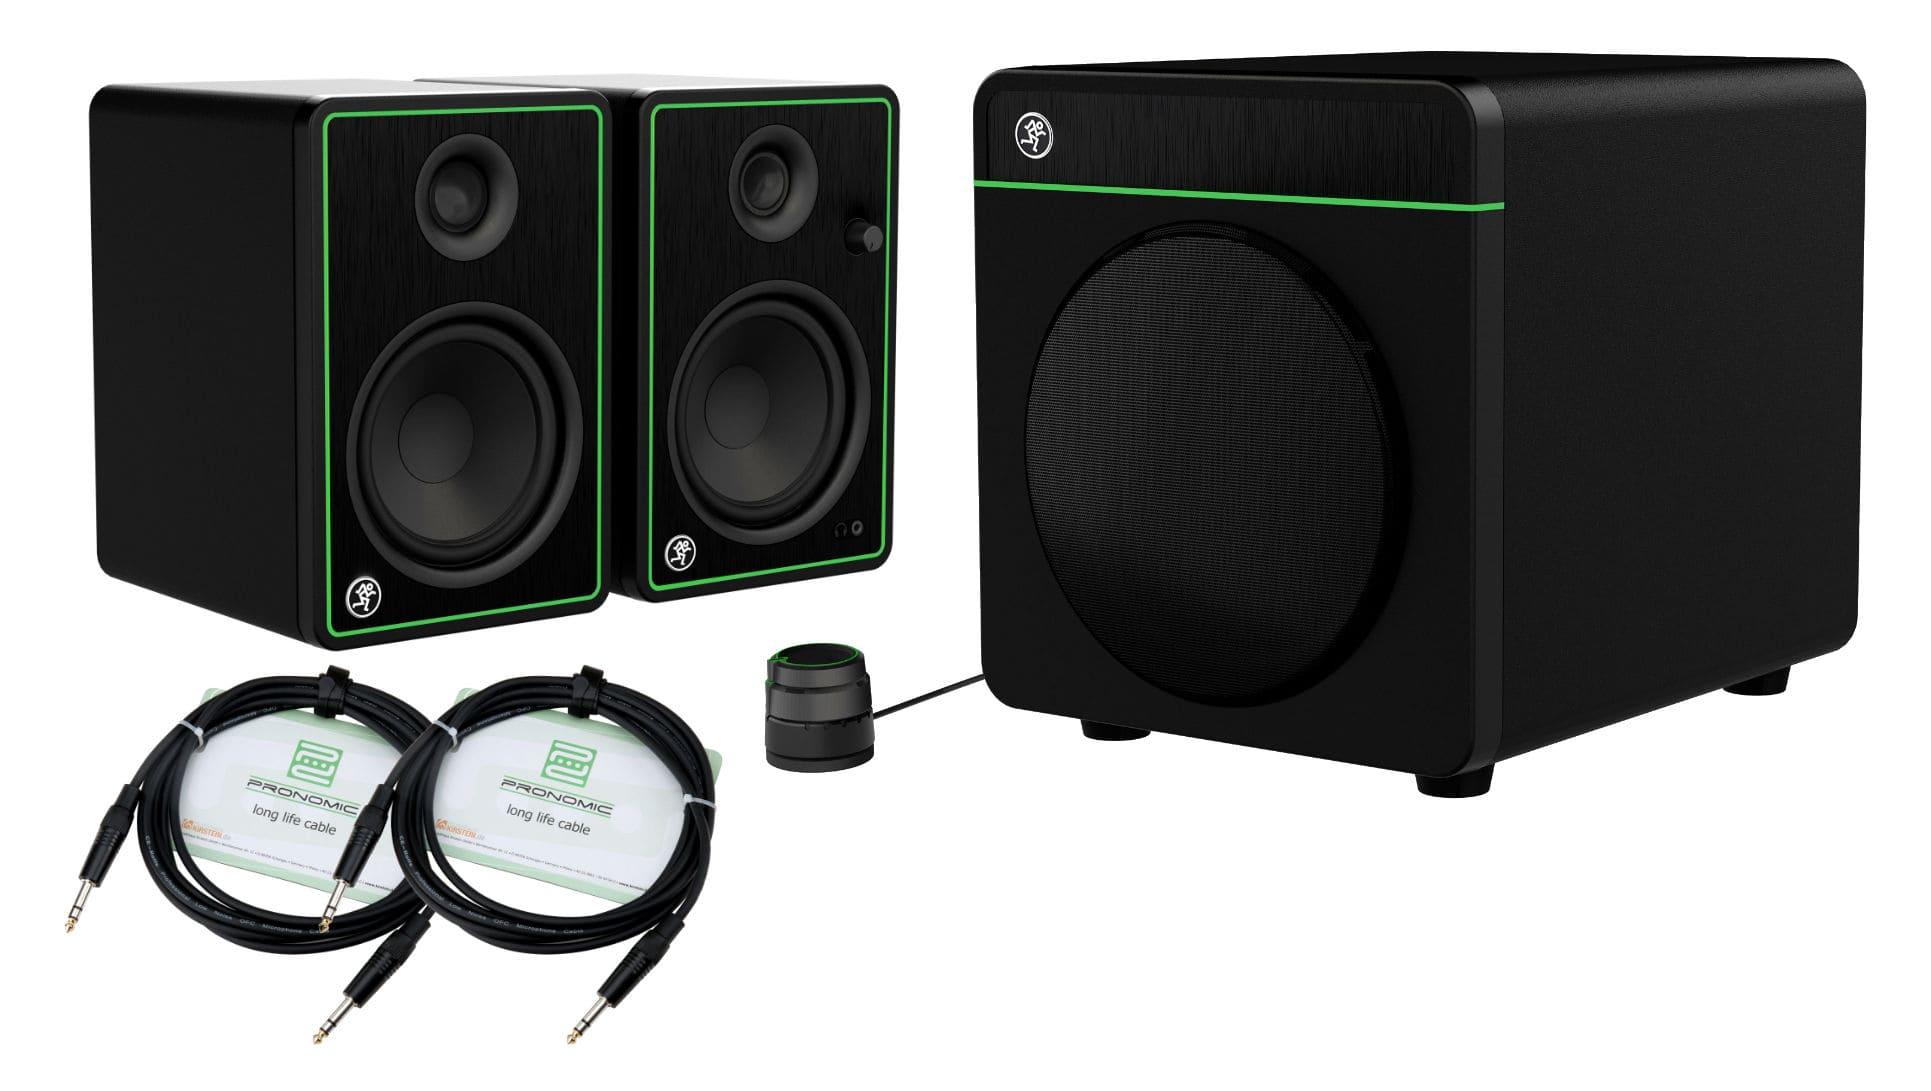 Studiomonitore - Mackie CR5 X Multimedia Bluetooth 2.1 Soundsystem - Onlineshop Musikhaus Kirstein